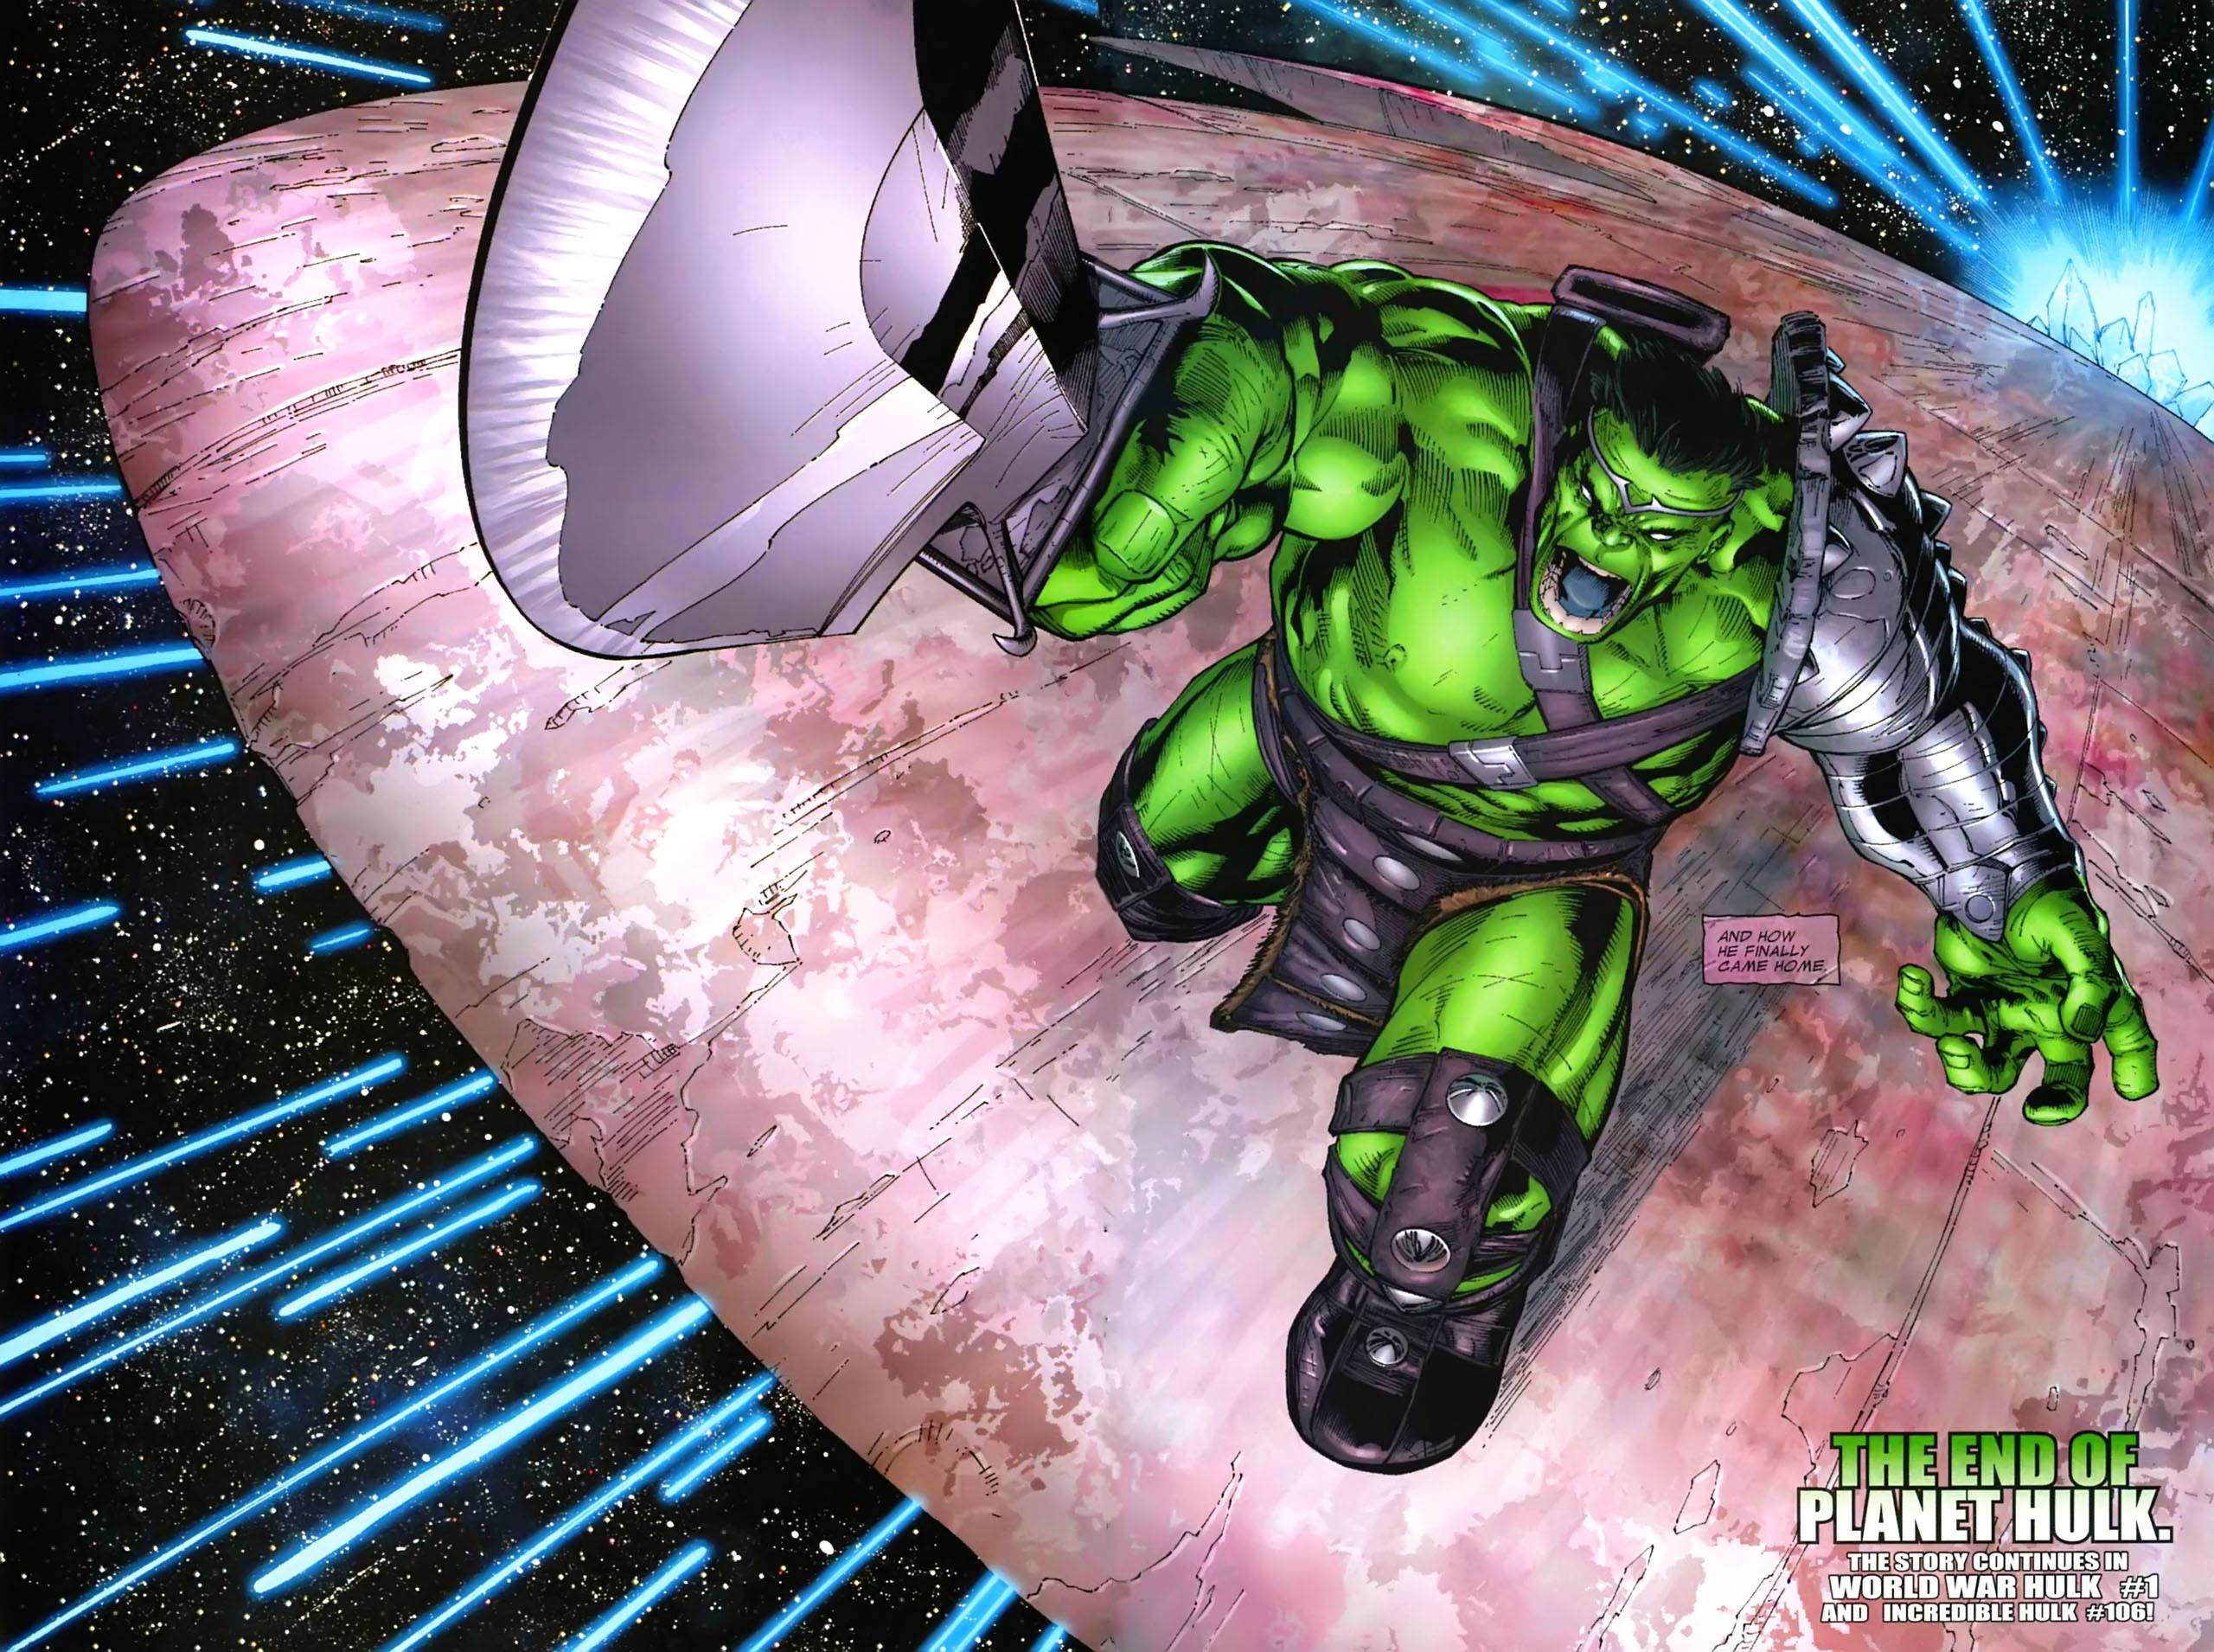 Simple Wallpaper Marvel The Incredible Hulk - 845577-download-free-incredible-hulk-wallpaper-2018-2560x1910-windows-10  Best Photo Reference_472182.jpg